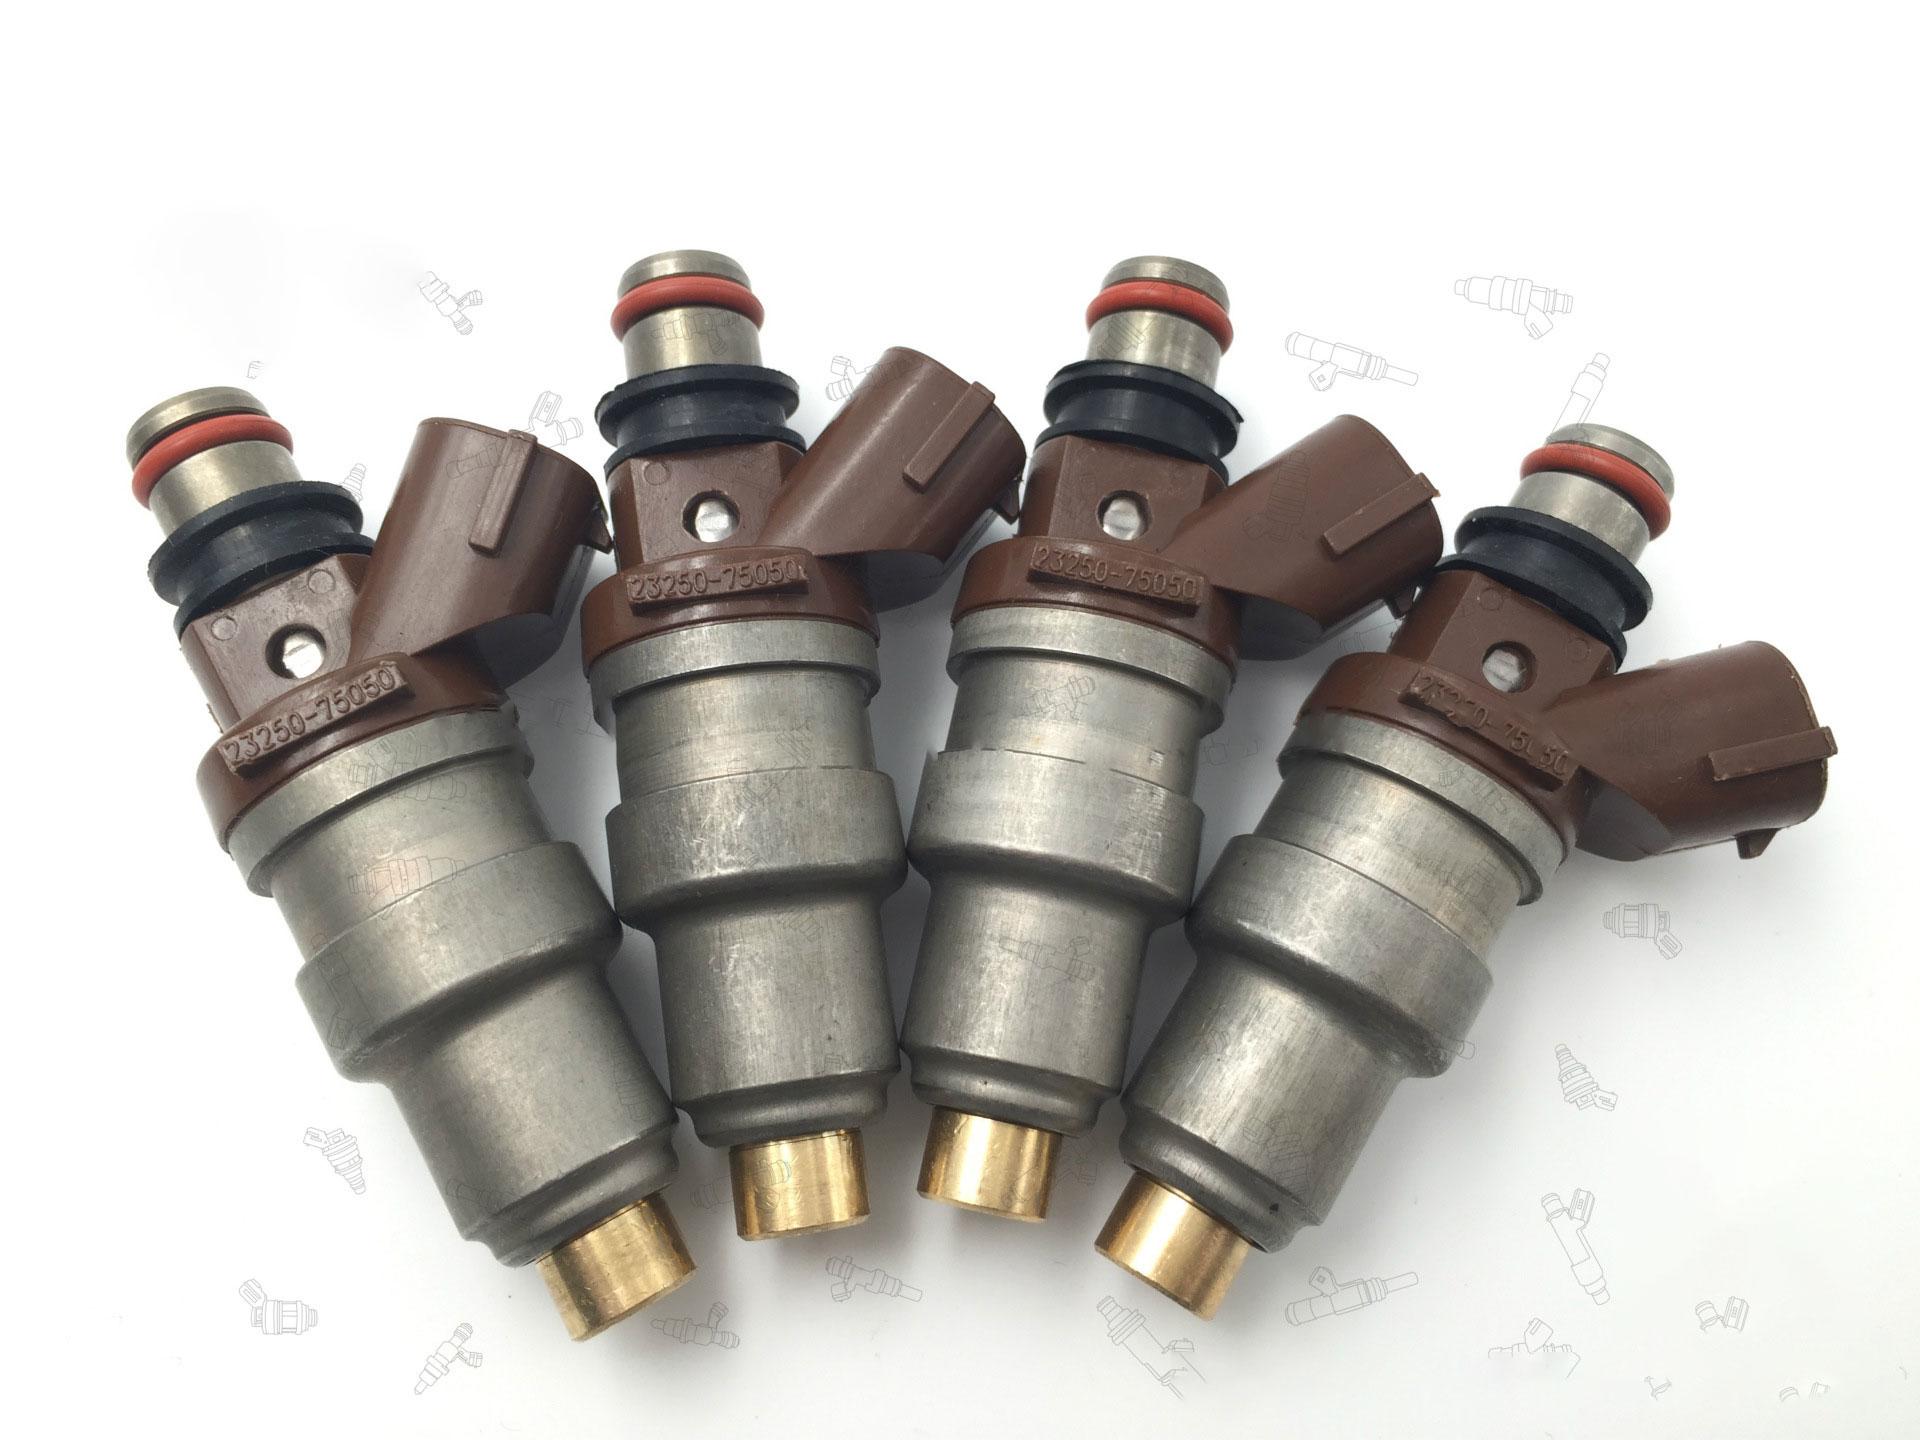 XWAUTOGJ Set Of 4 Fuel Injector Nozzles For 1996-2000 Toyota 4Runner Tacoma T100 2.7L L4 2320979095 23250-75050 23209-79095 2320939015